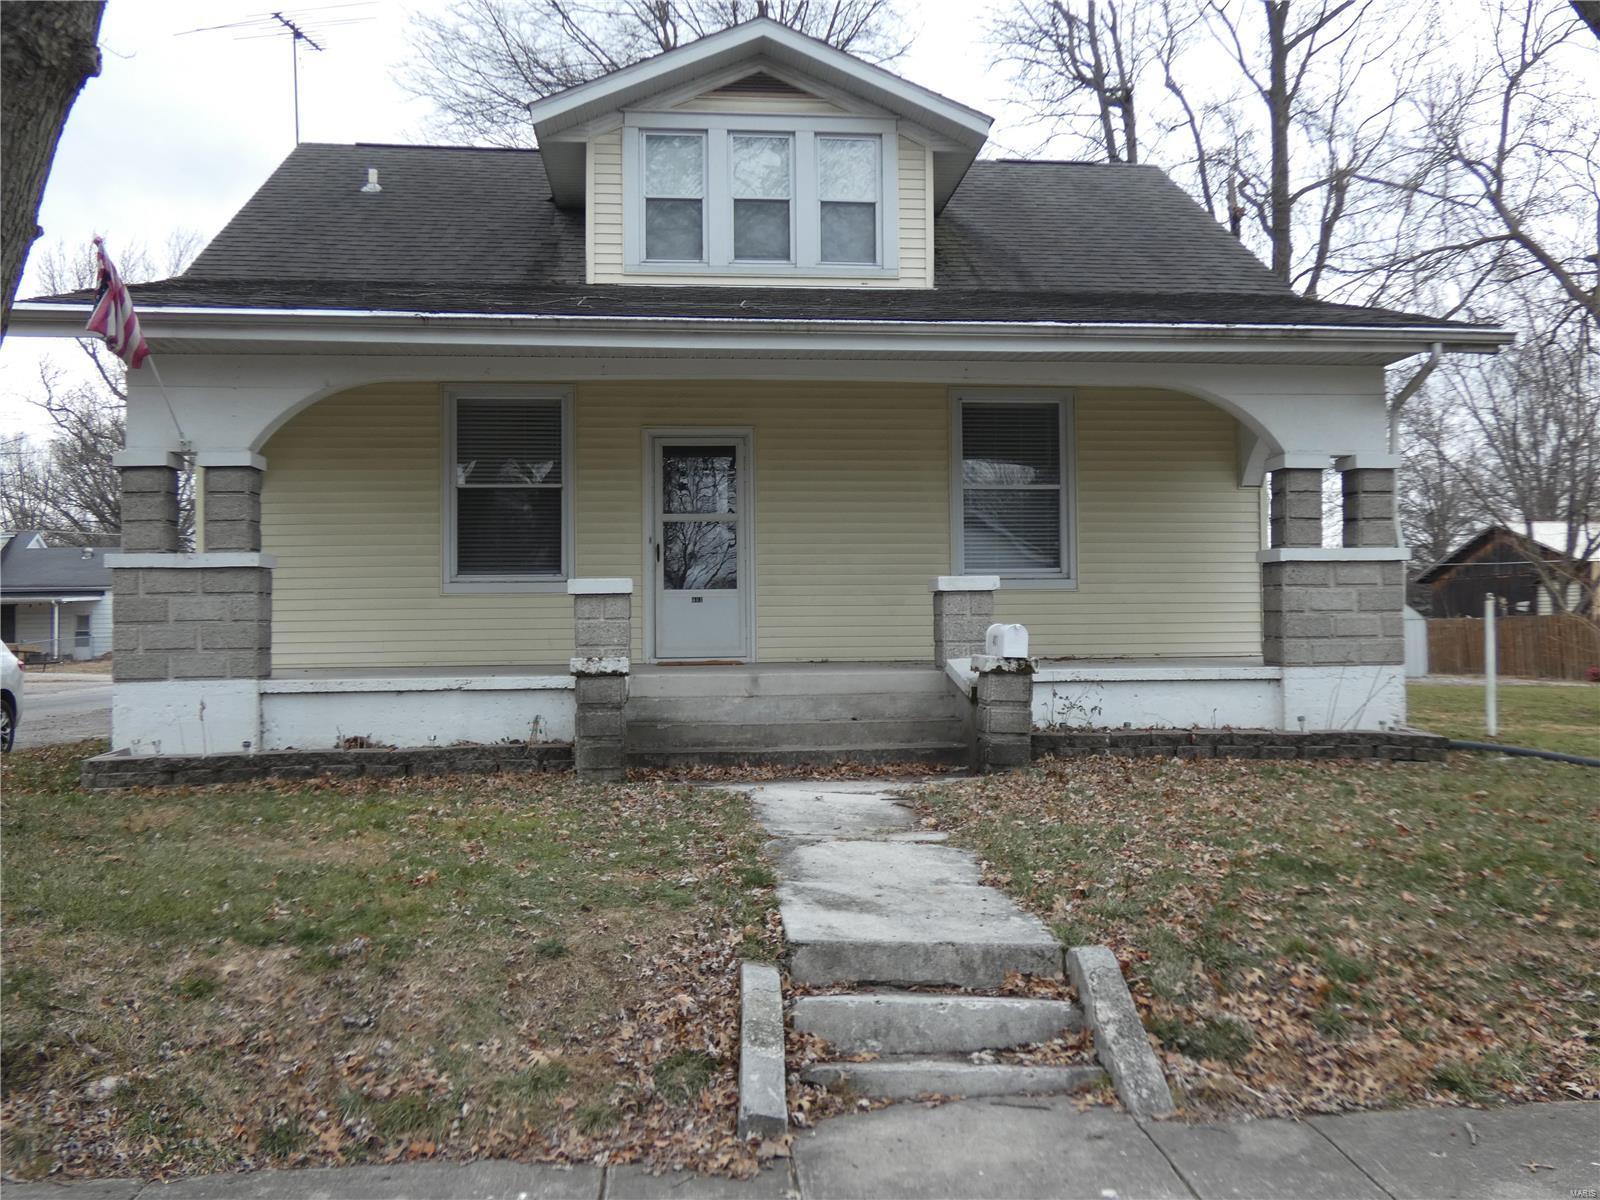 401 N Edison Property Photo - Freeburg, IL real estate listing